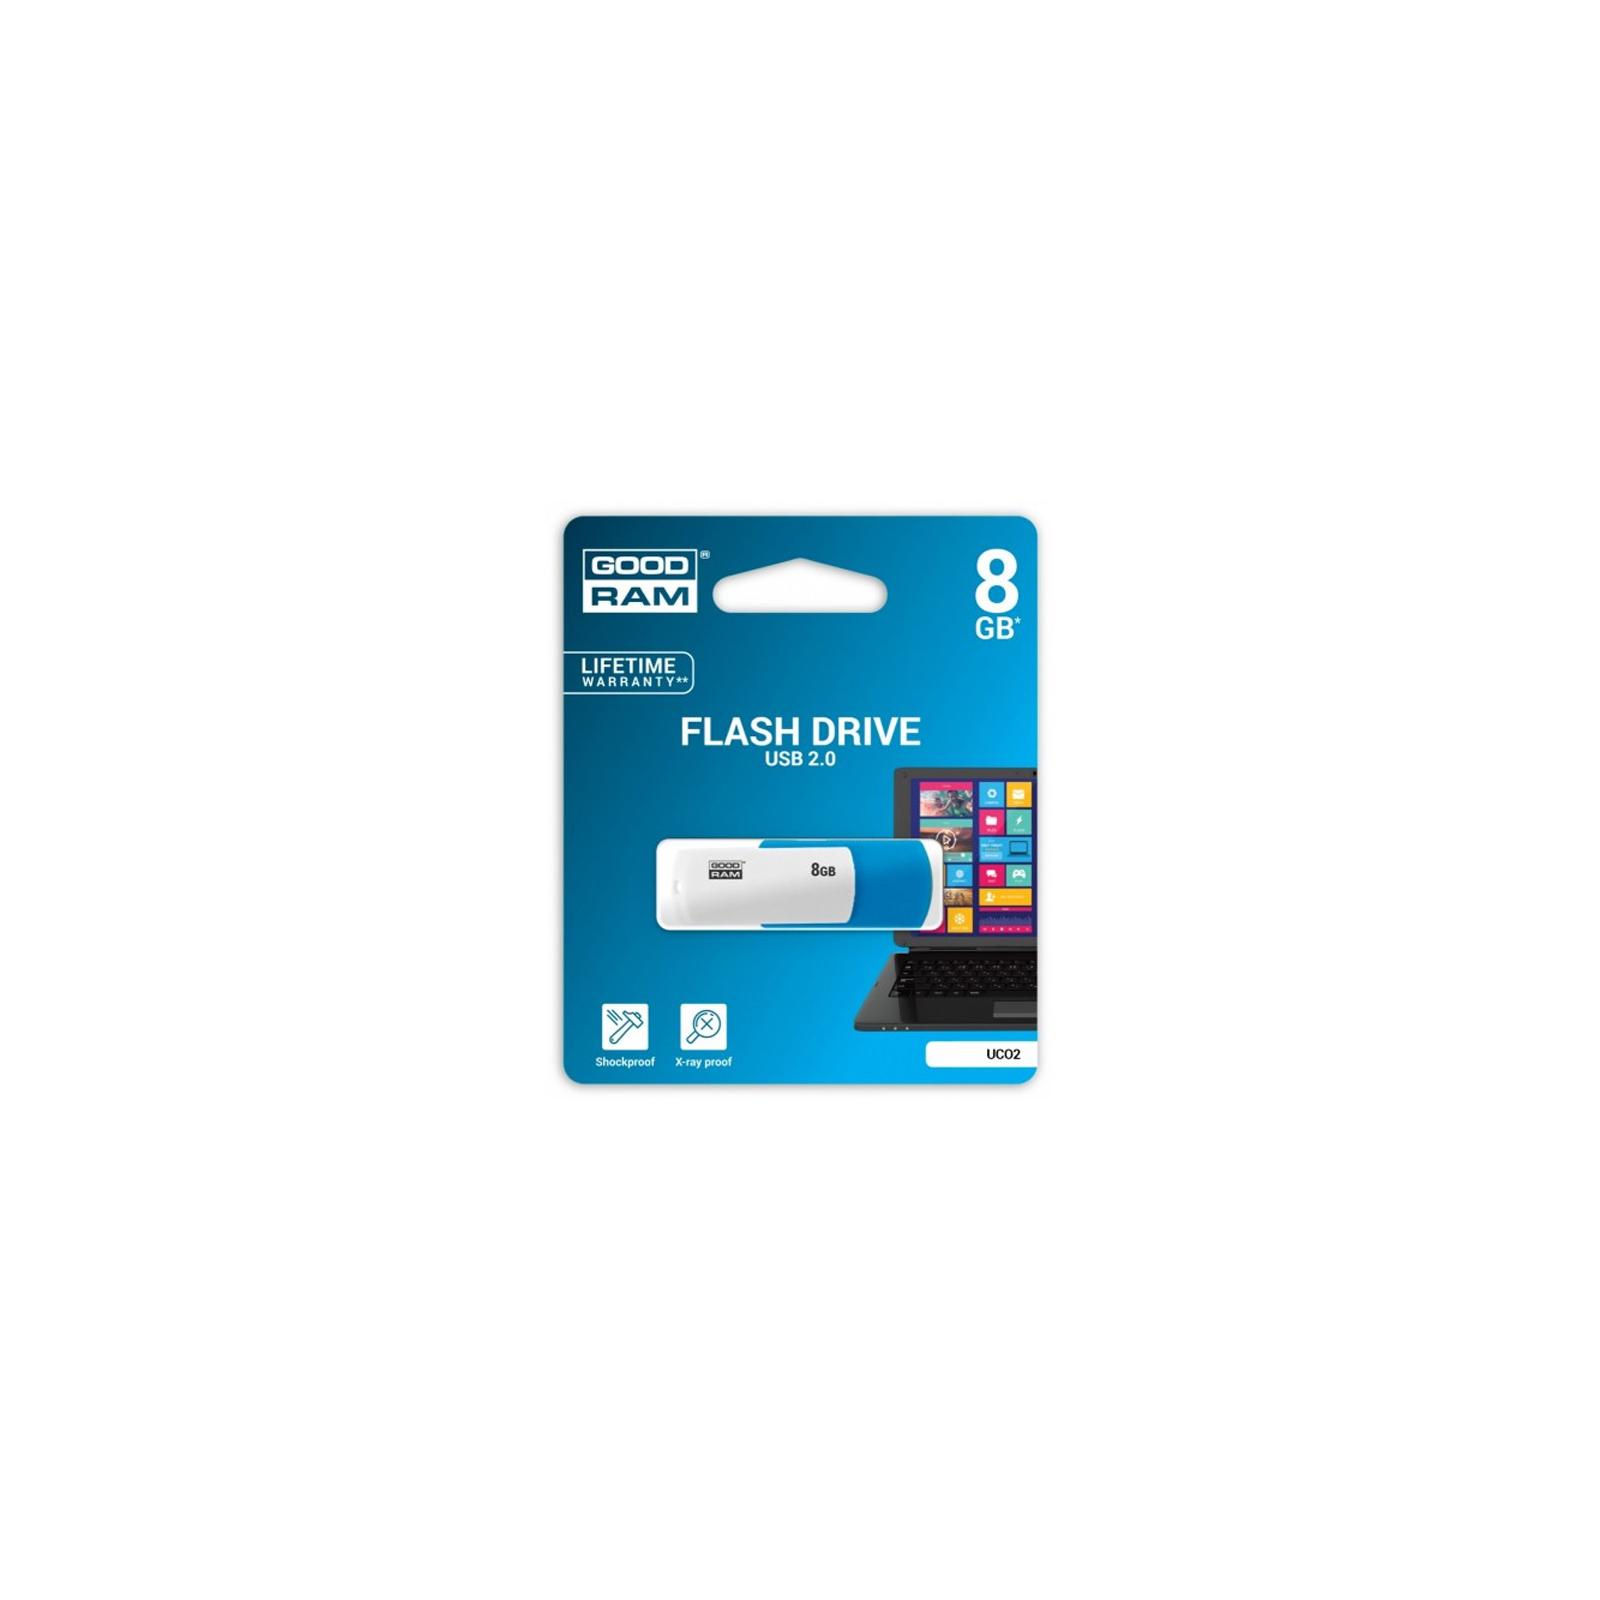 USB флеш накопитель Goodram 128GB UCO2 Colour Black&White USB 2.0 (UCO2-1280KWR11) изображение 2